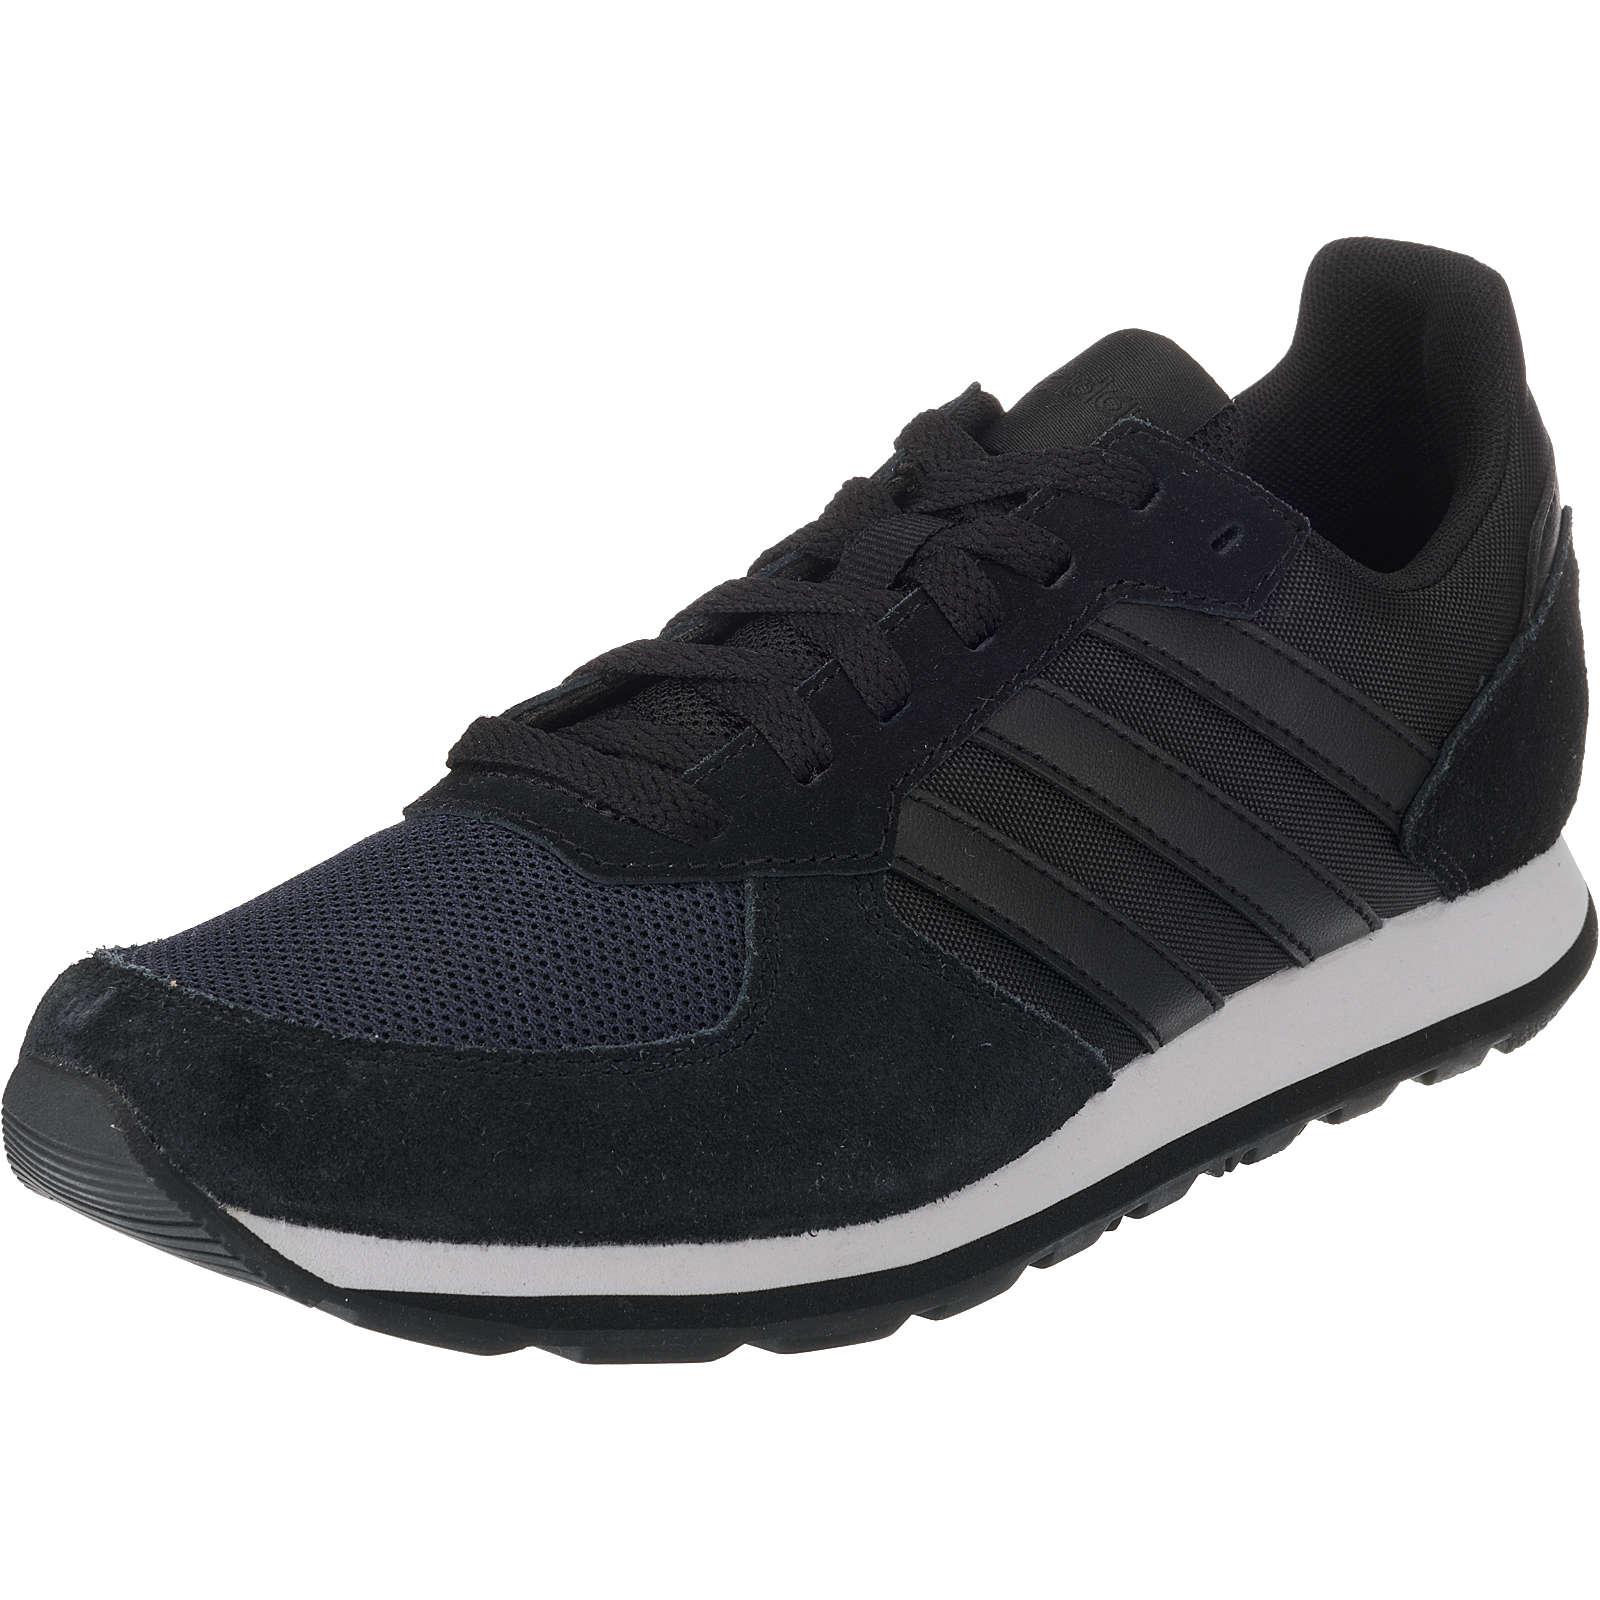 adidas Sport Inspired 8K Sneakers Low schwarz Damen Gr. 39 1/3